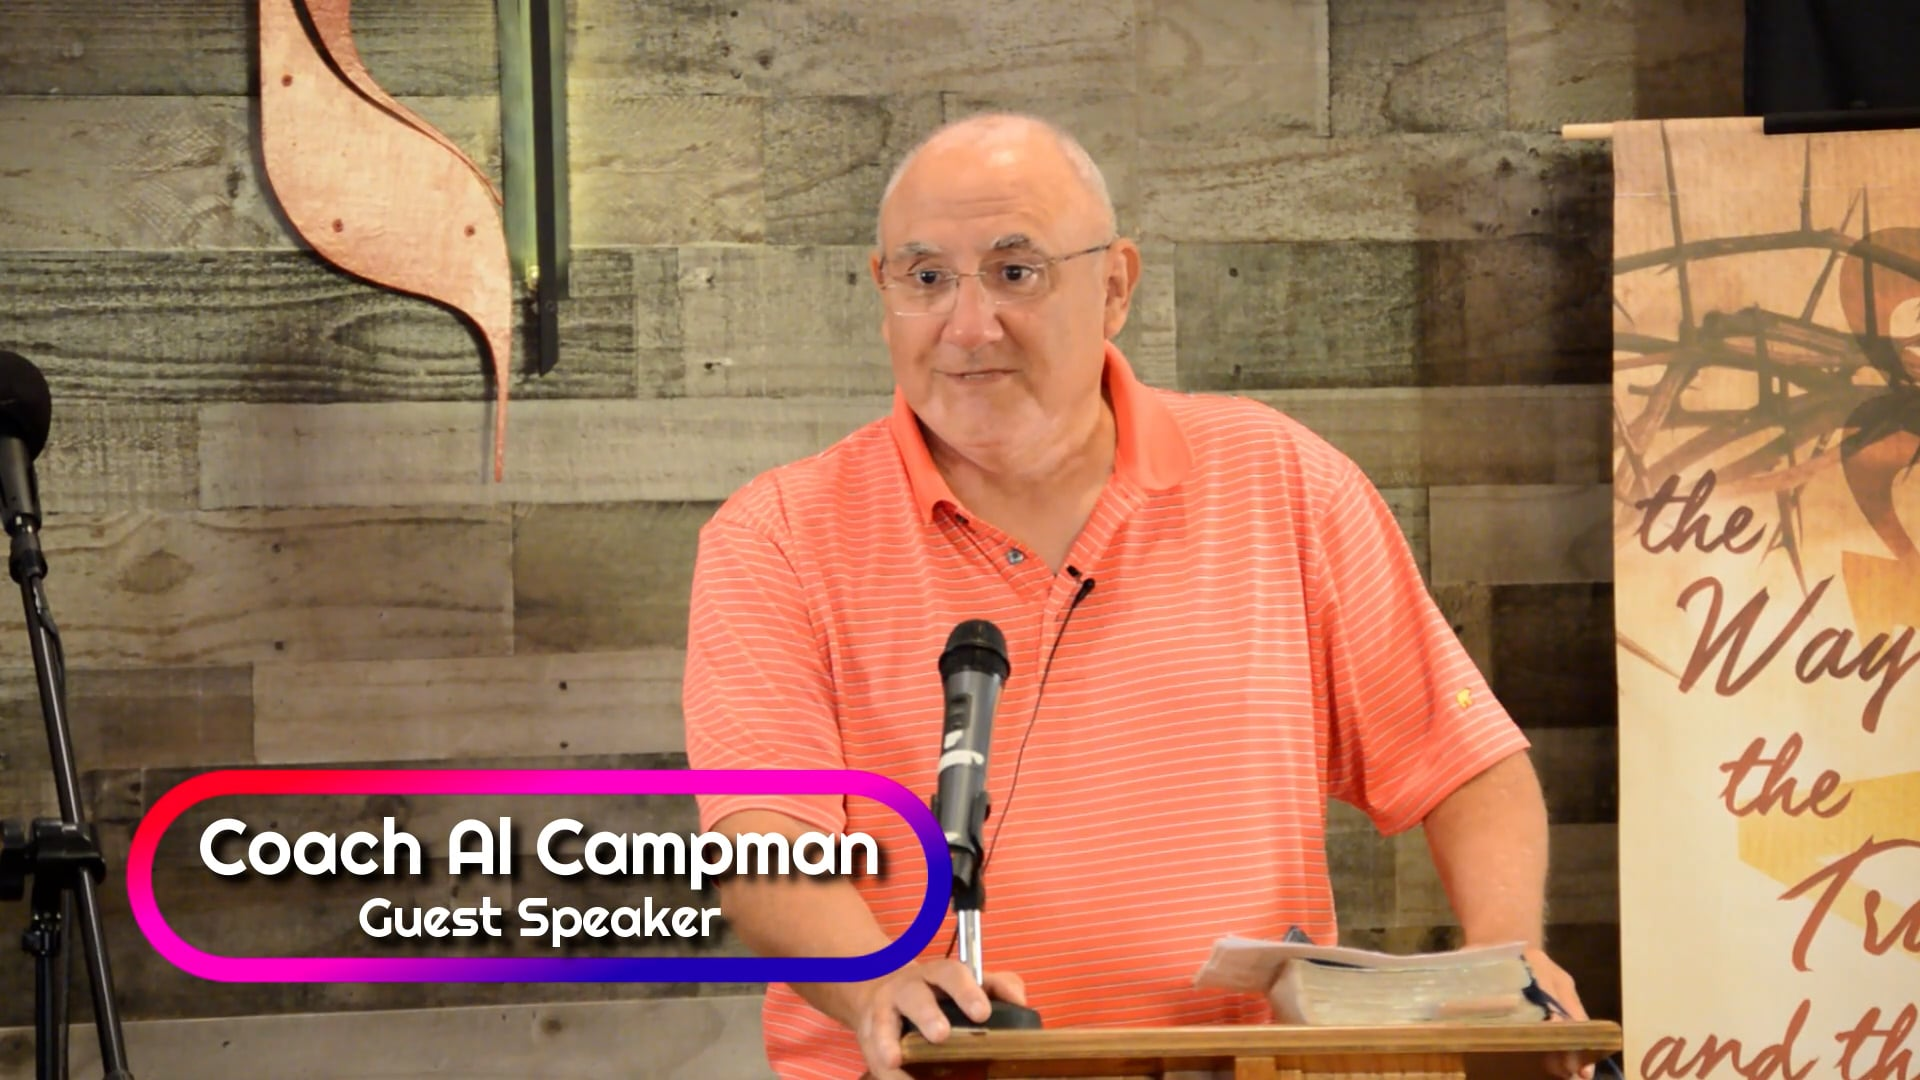 Online Worship October 3, 2021 - Special Guest Speaker: Al Campman